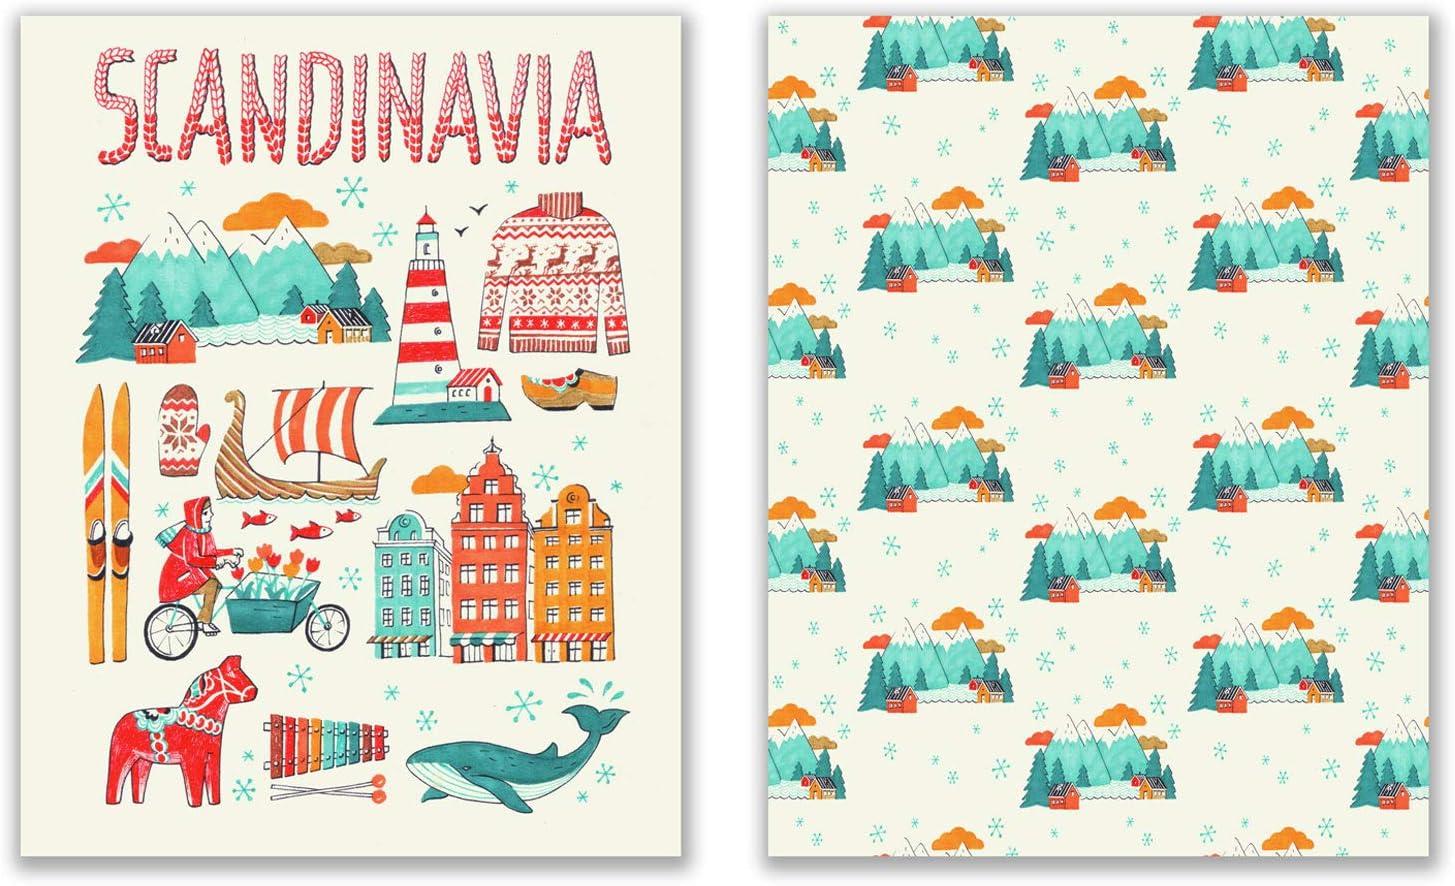 Scandinavian Travel Art Prints - Set of 2 (11x14) Inches Folk Art Hygge Swedish Danish Norse Finnish Wall Art Decor Minimalist Contemporary - Whale - Mountains - Sweaters - Longship